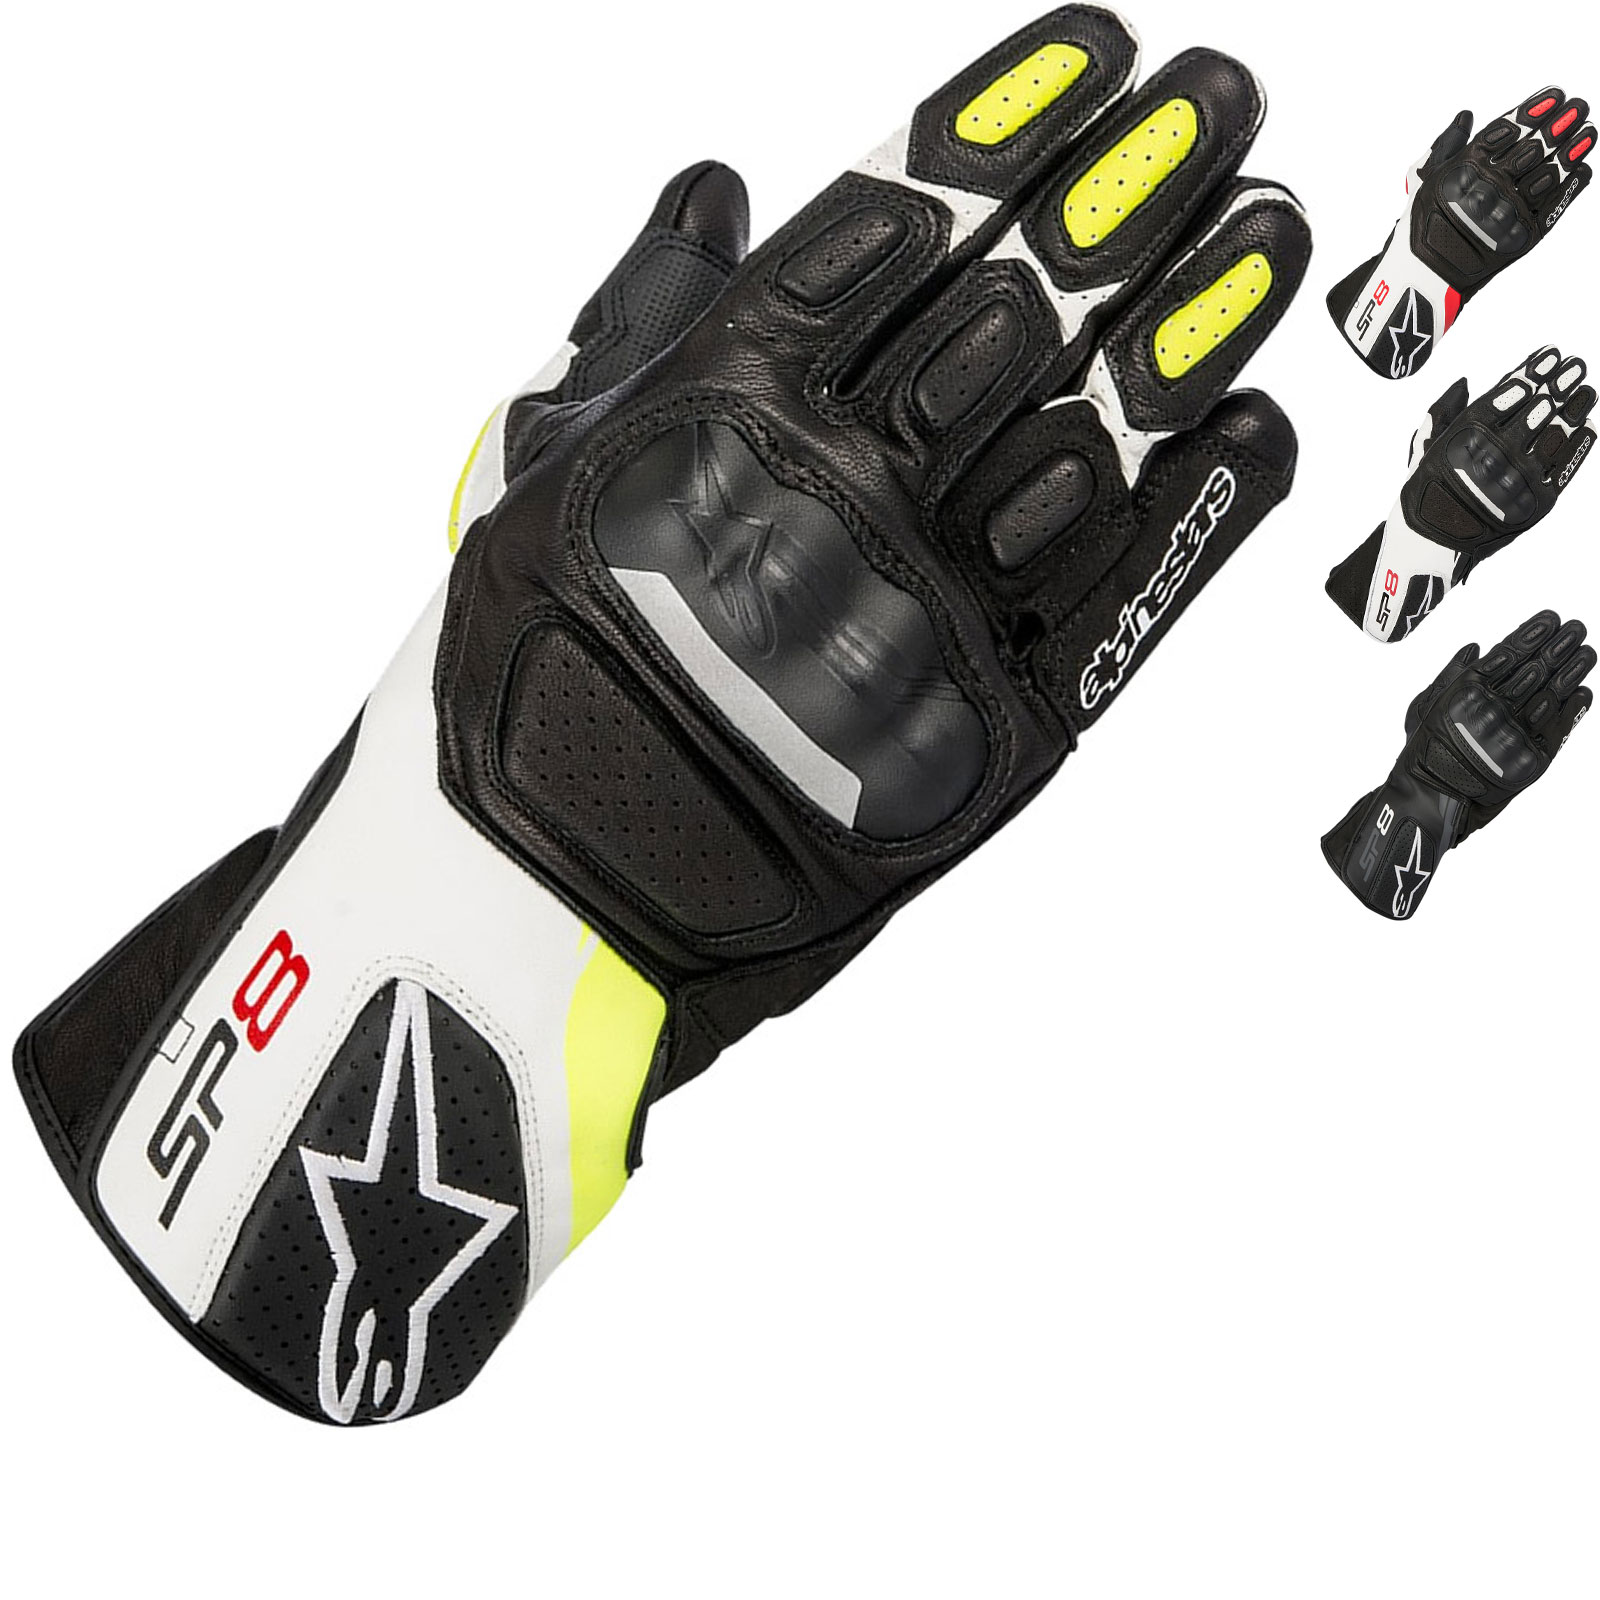 Alpinestars SP-8 v2 Leather Black Yellow Fluo Motorcycle Motorbike Touring Glove